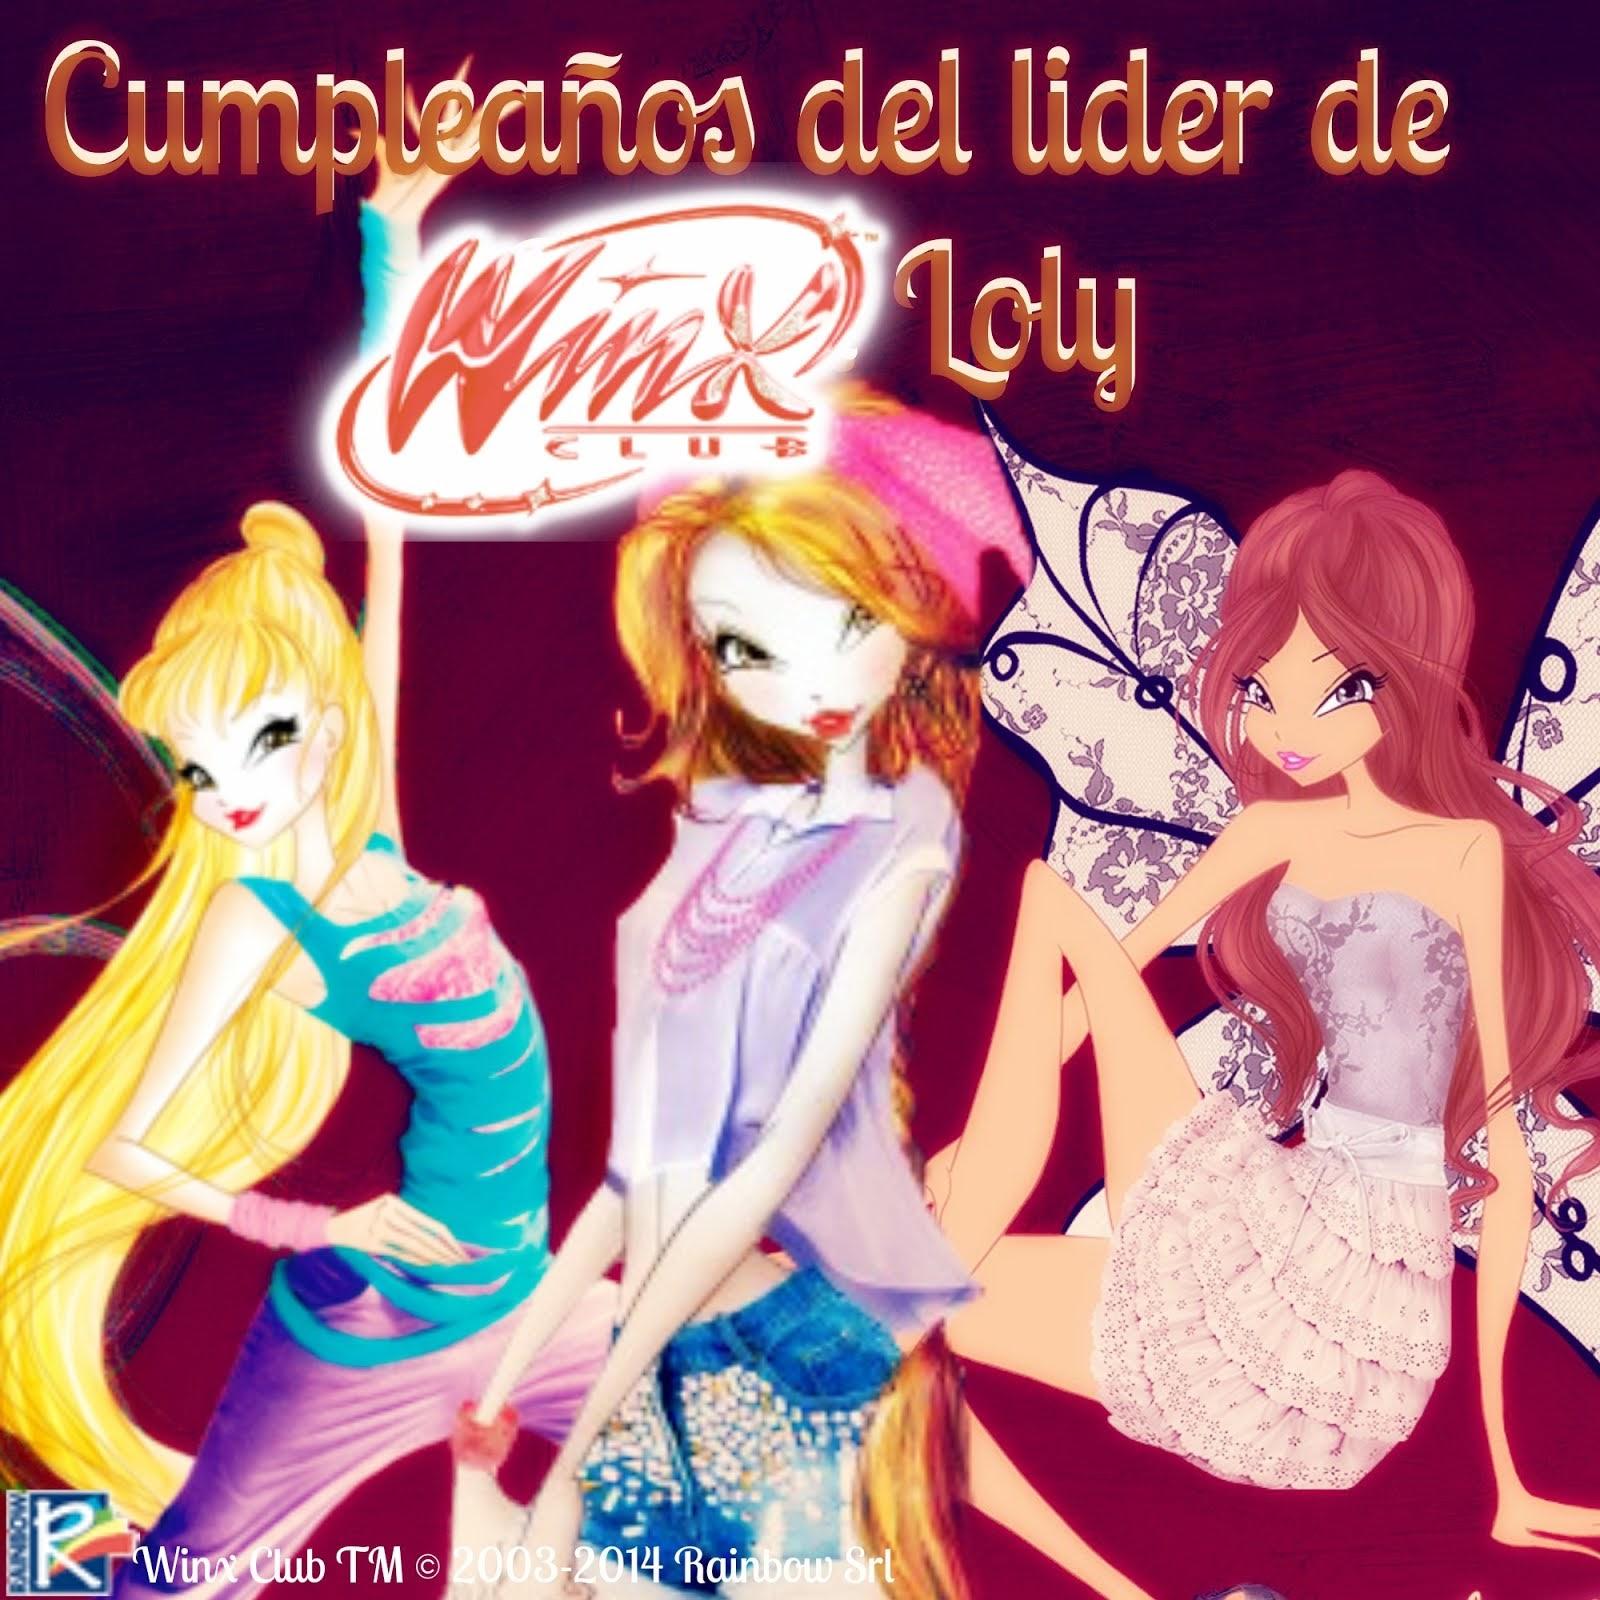 ¡¡Feliz Cumpleaños Lider!!